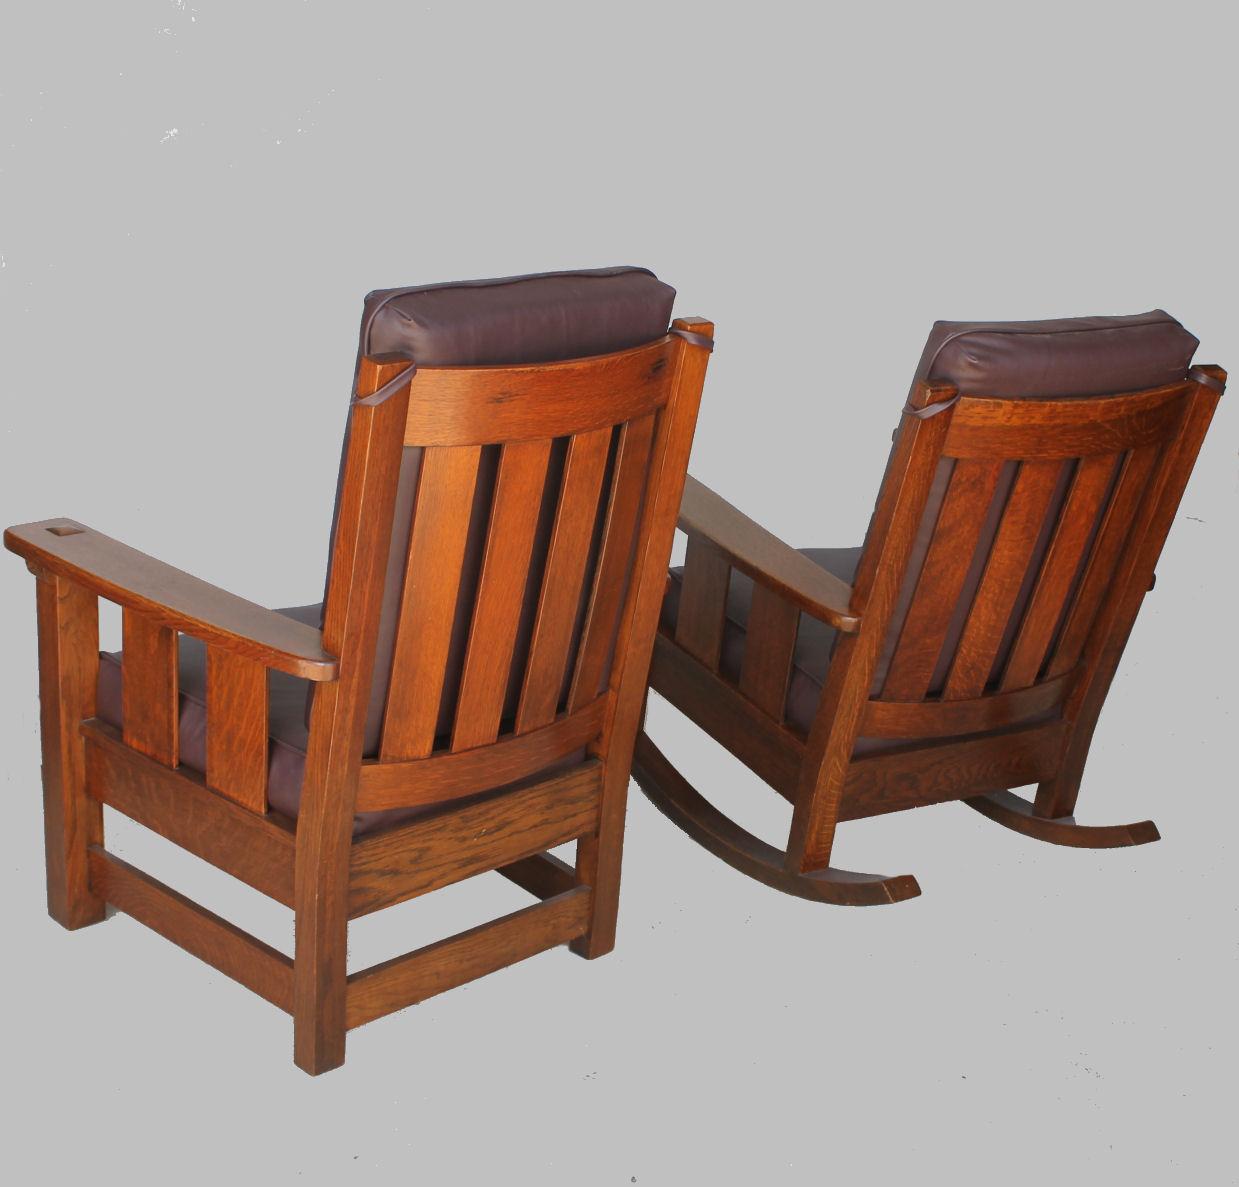 mission arm chair us leisure adirondack bargain john 39s antiques antique limbert set